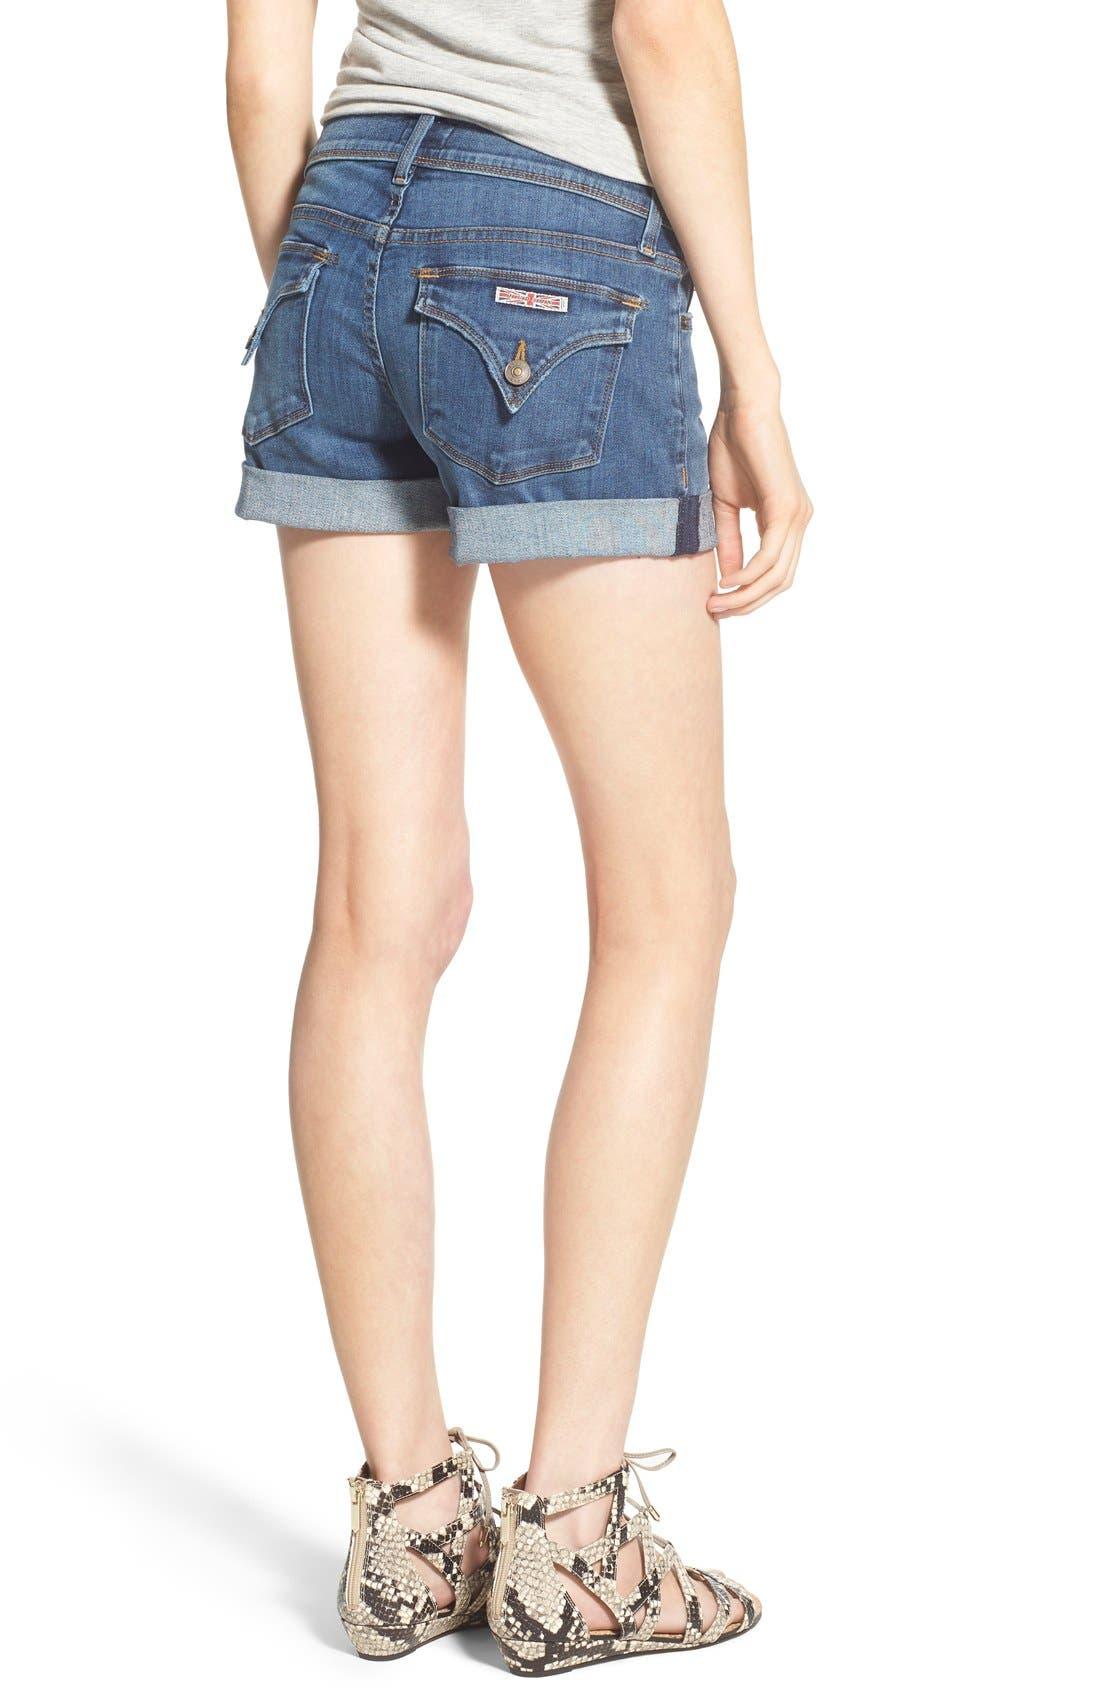 'Croxley' Cuffed Denim Shorts,                             Alternate thumbnail 2, color,                             Advantageous